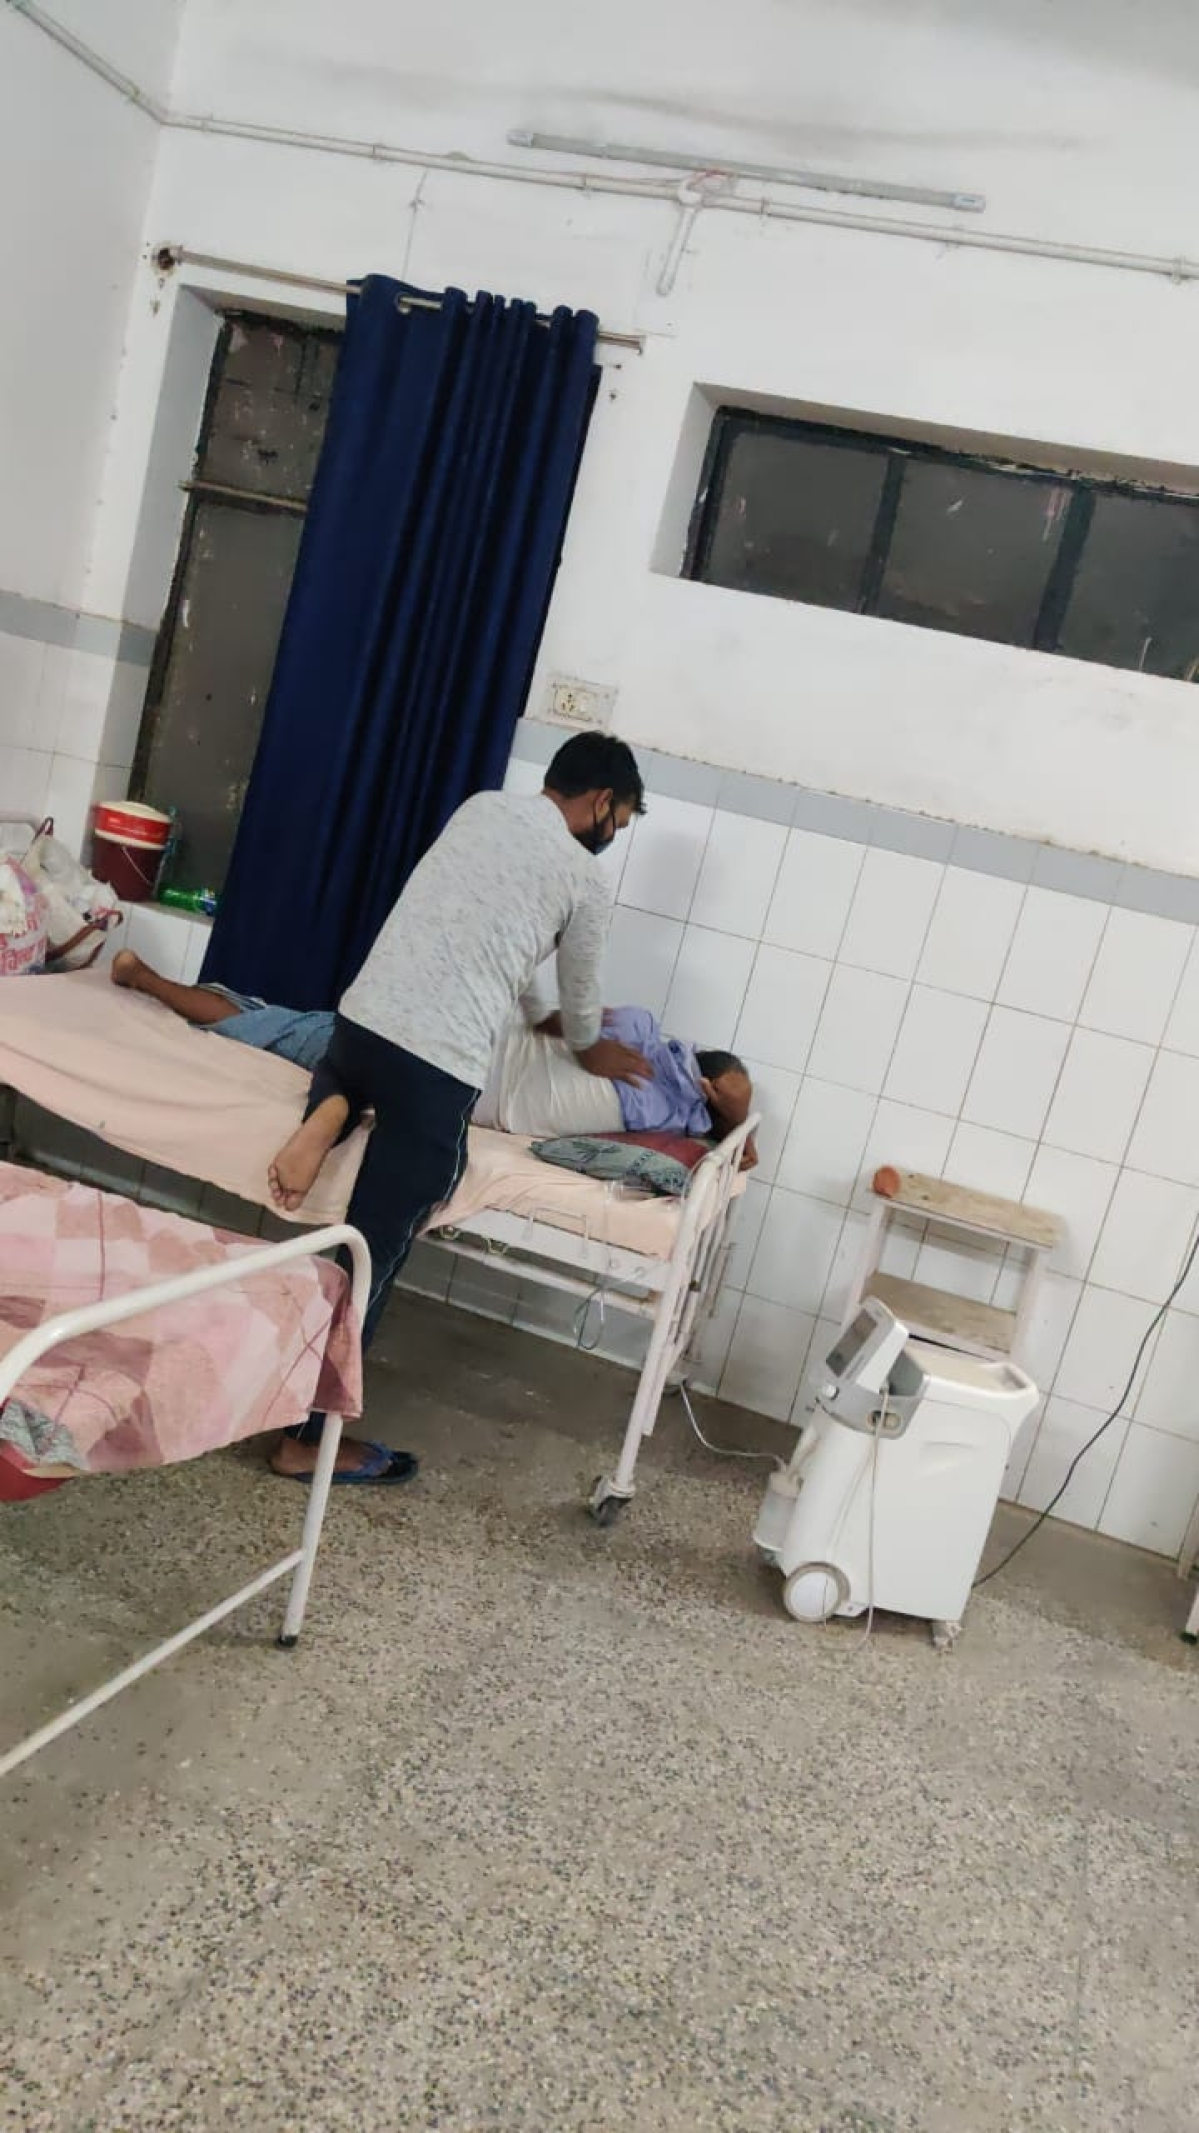 Pandit Kamla Pati Tripathi Zilla hospital with 10 dedicated covid beds